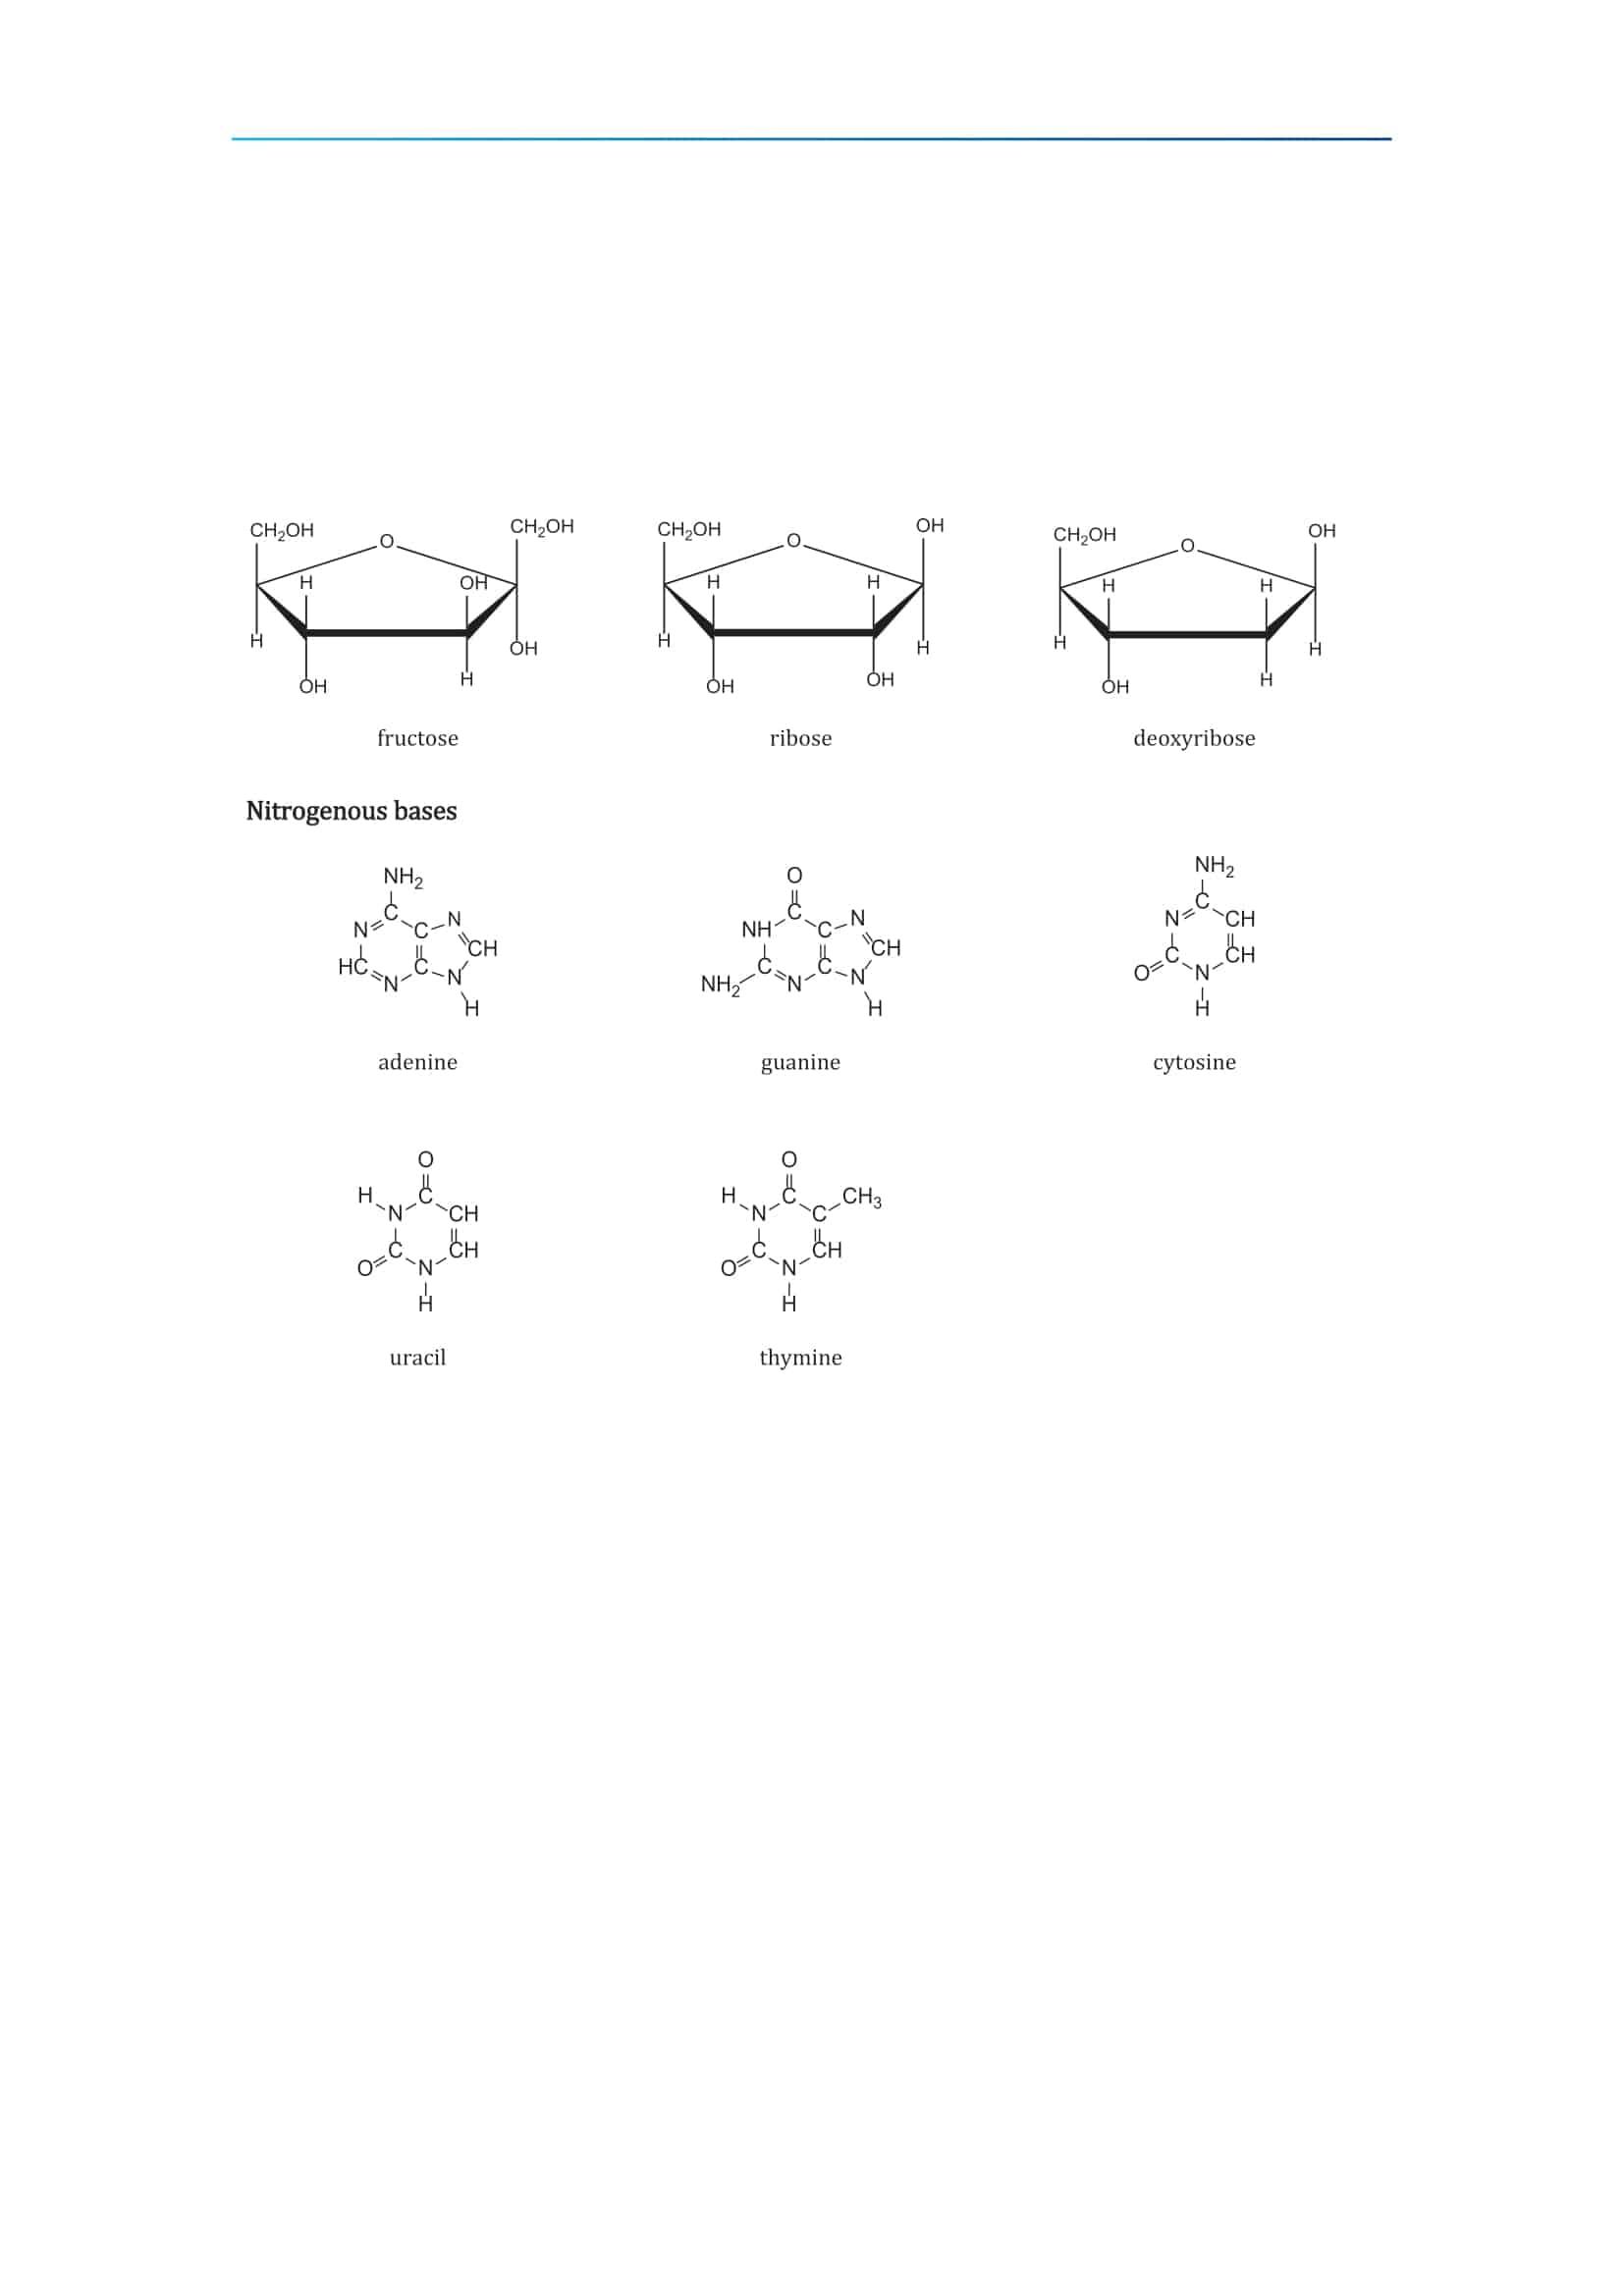 IB Chemistry Data Booklet 2020 38